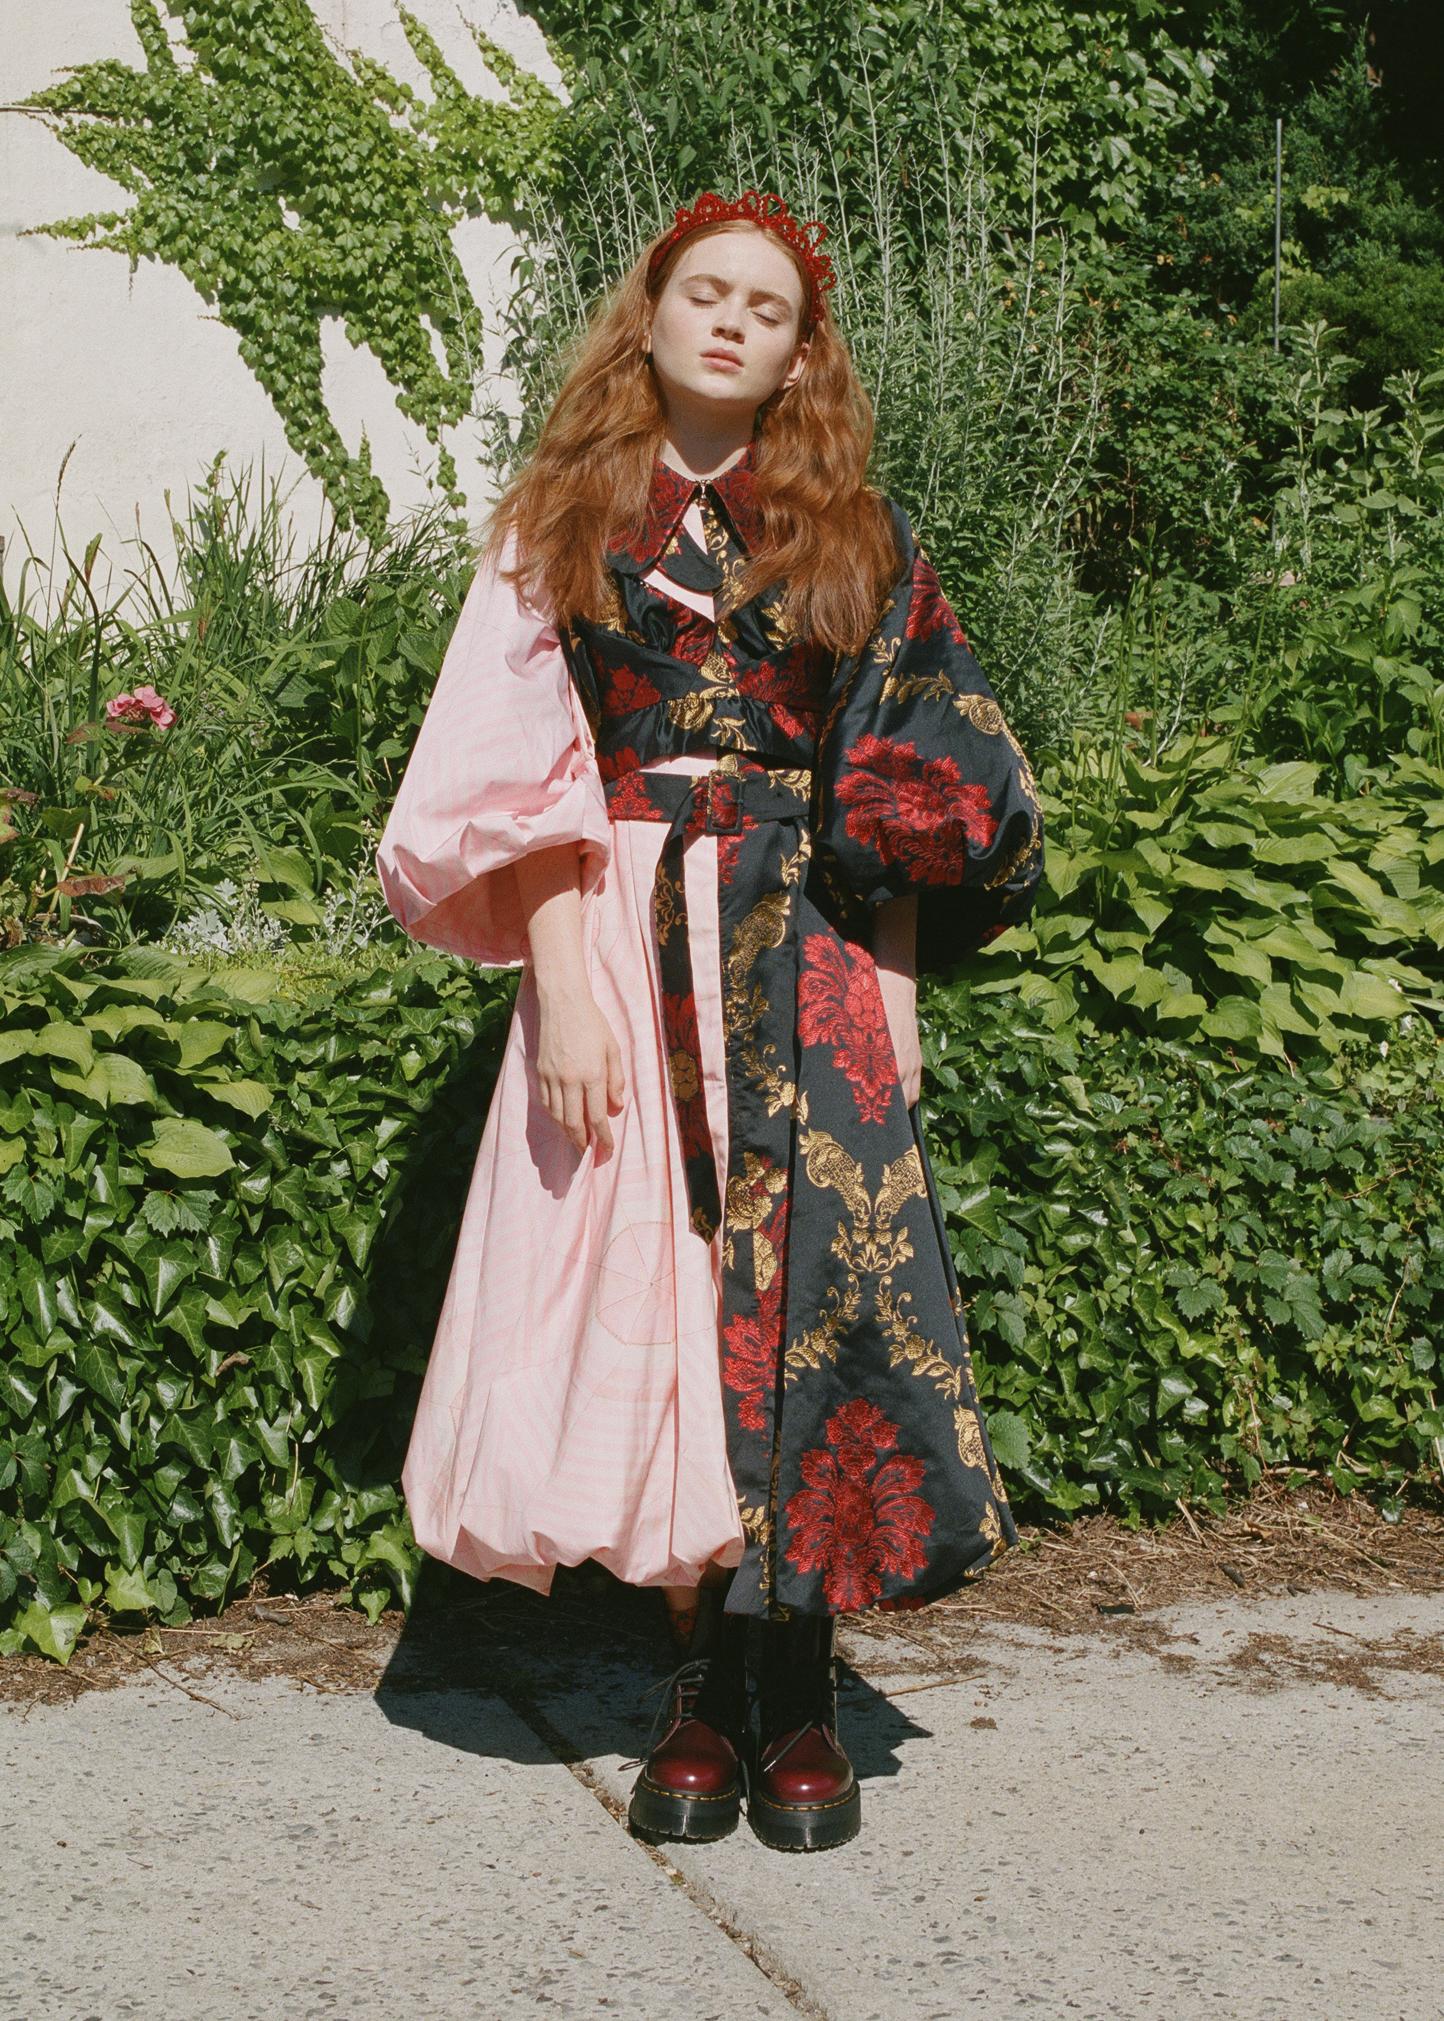 sadie_sink_amber_mahoney_who_what_wear_004.jpg